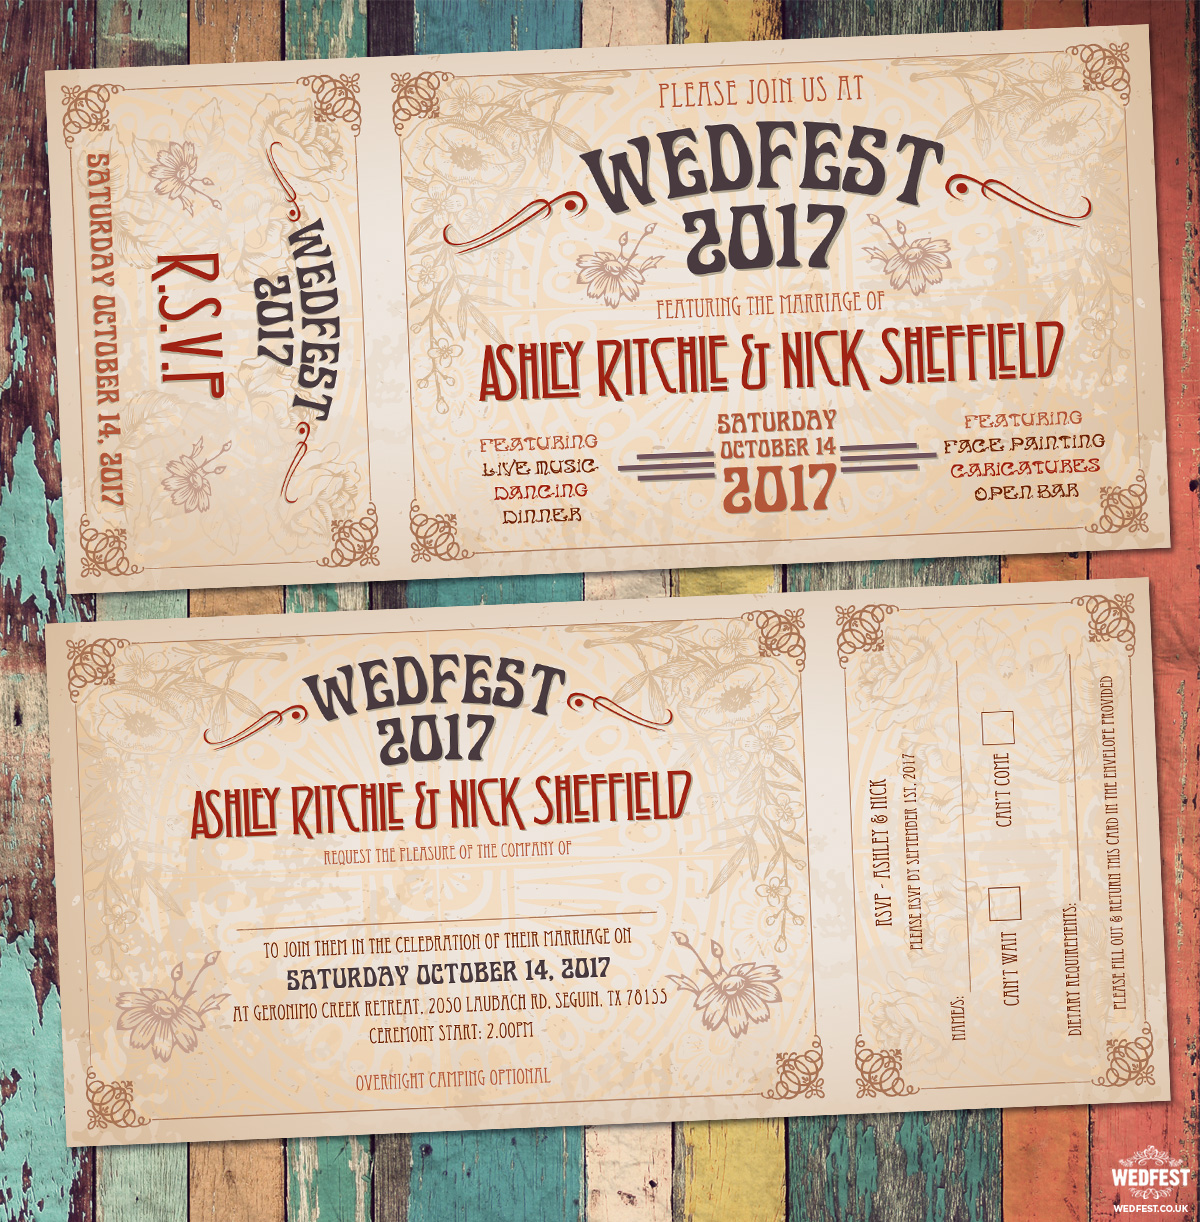 wedfest vintage festival ticket-wedding invitation